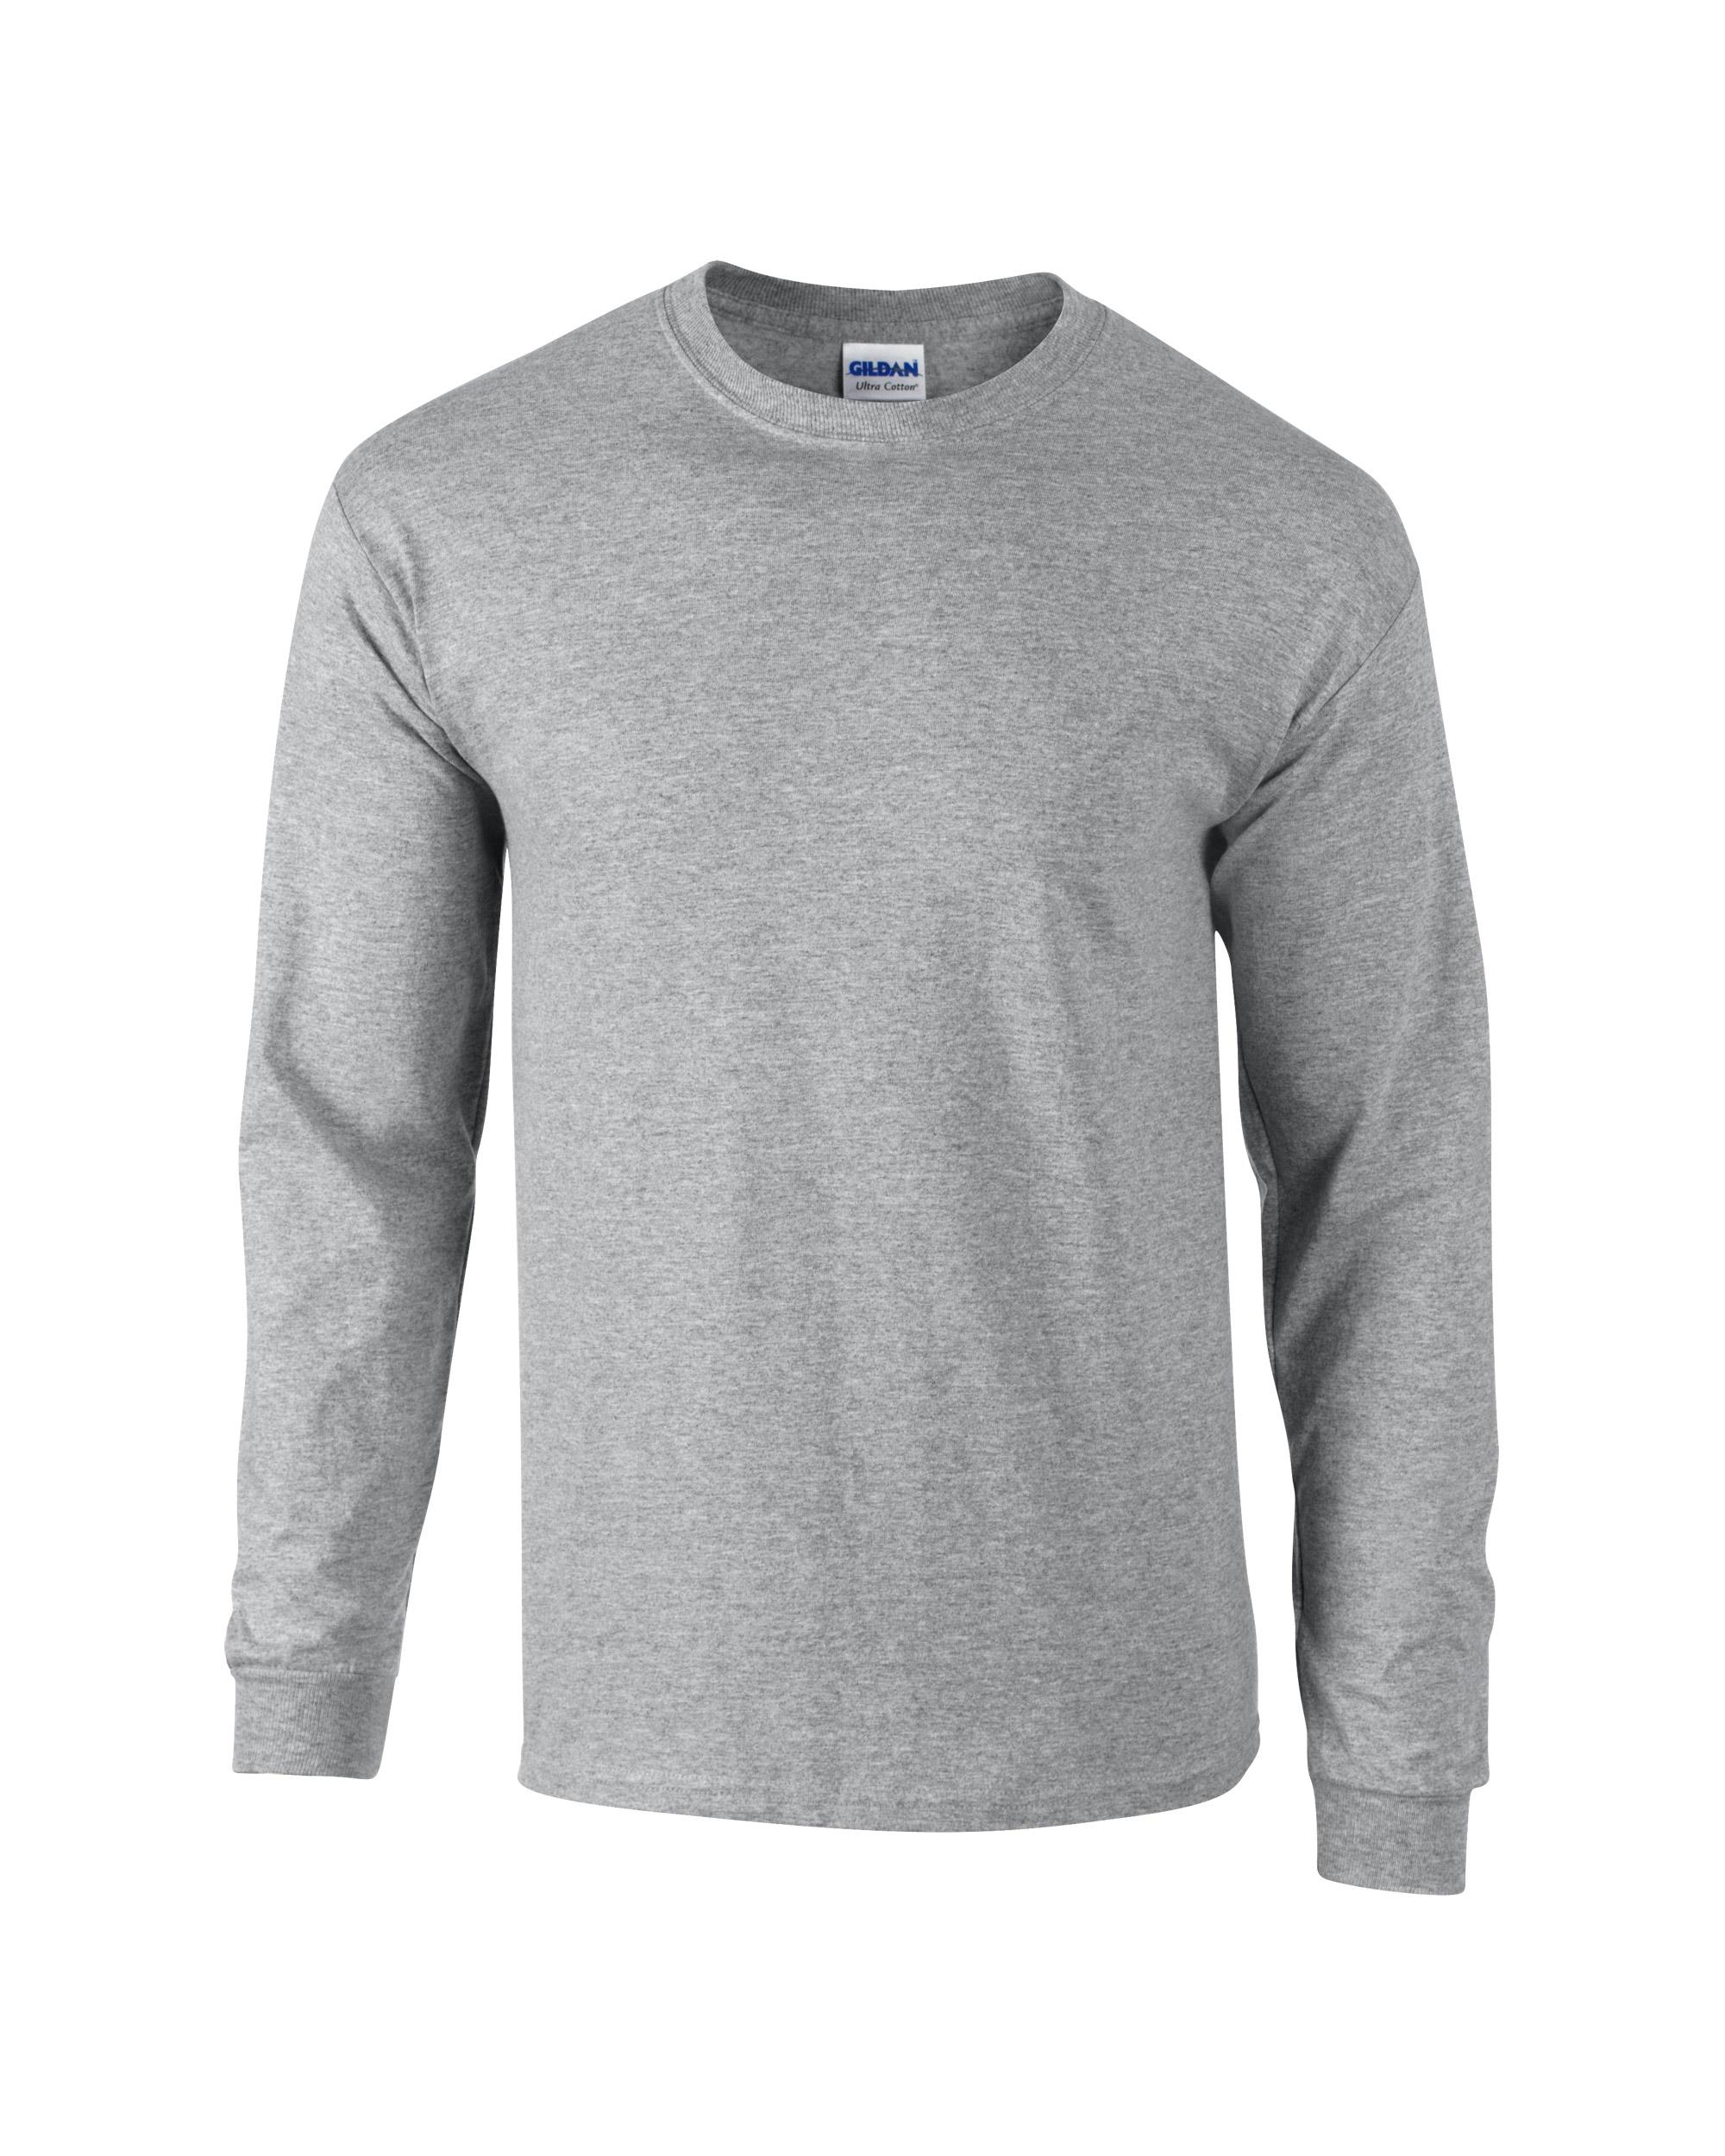 Mens T Shirts 4xl